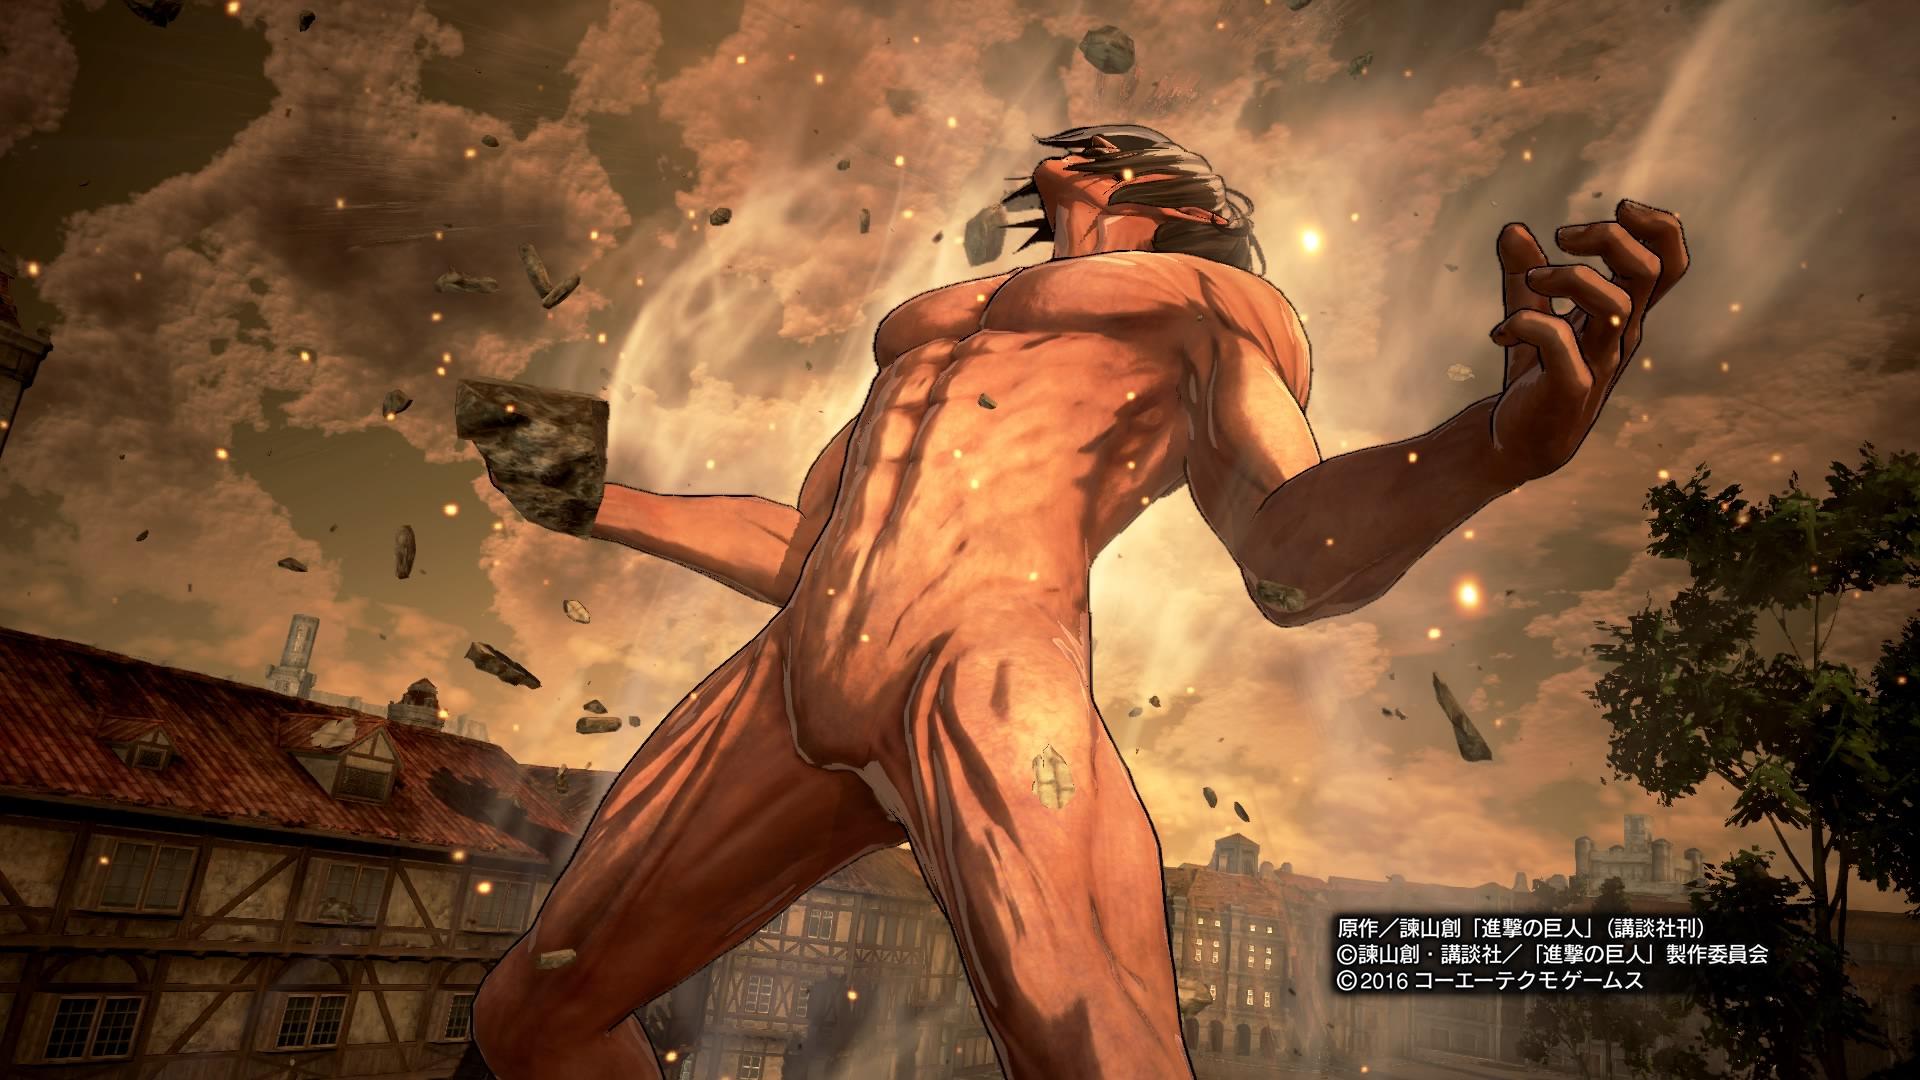 Ps4 Ps3 Ps Vita 進撃の巨人 レビュー 進撃の巨人 Game Watch